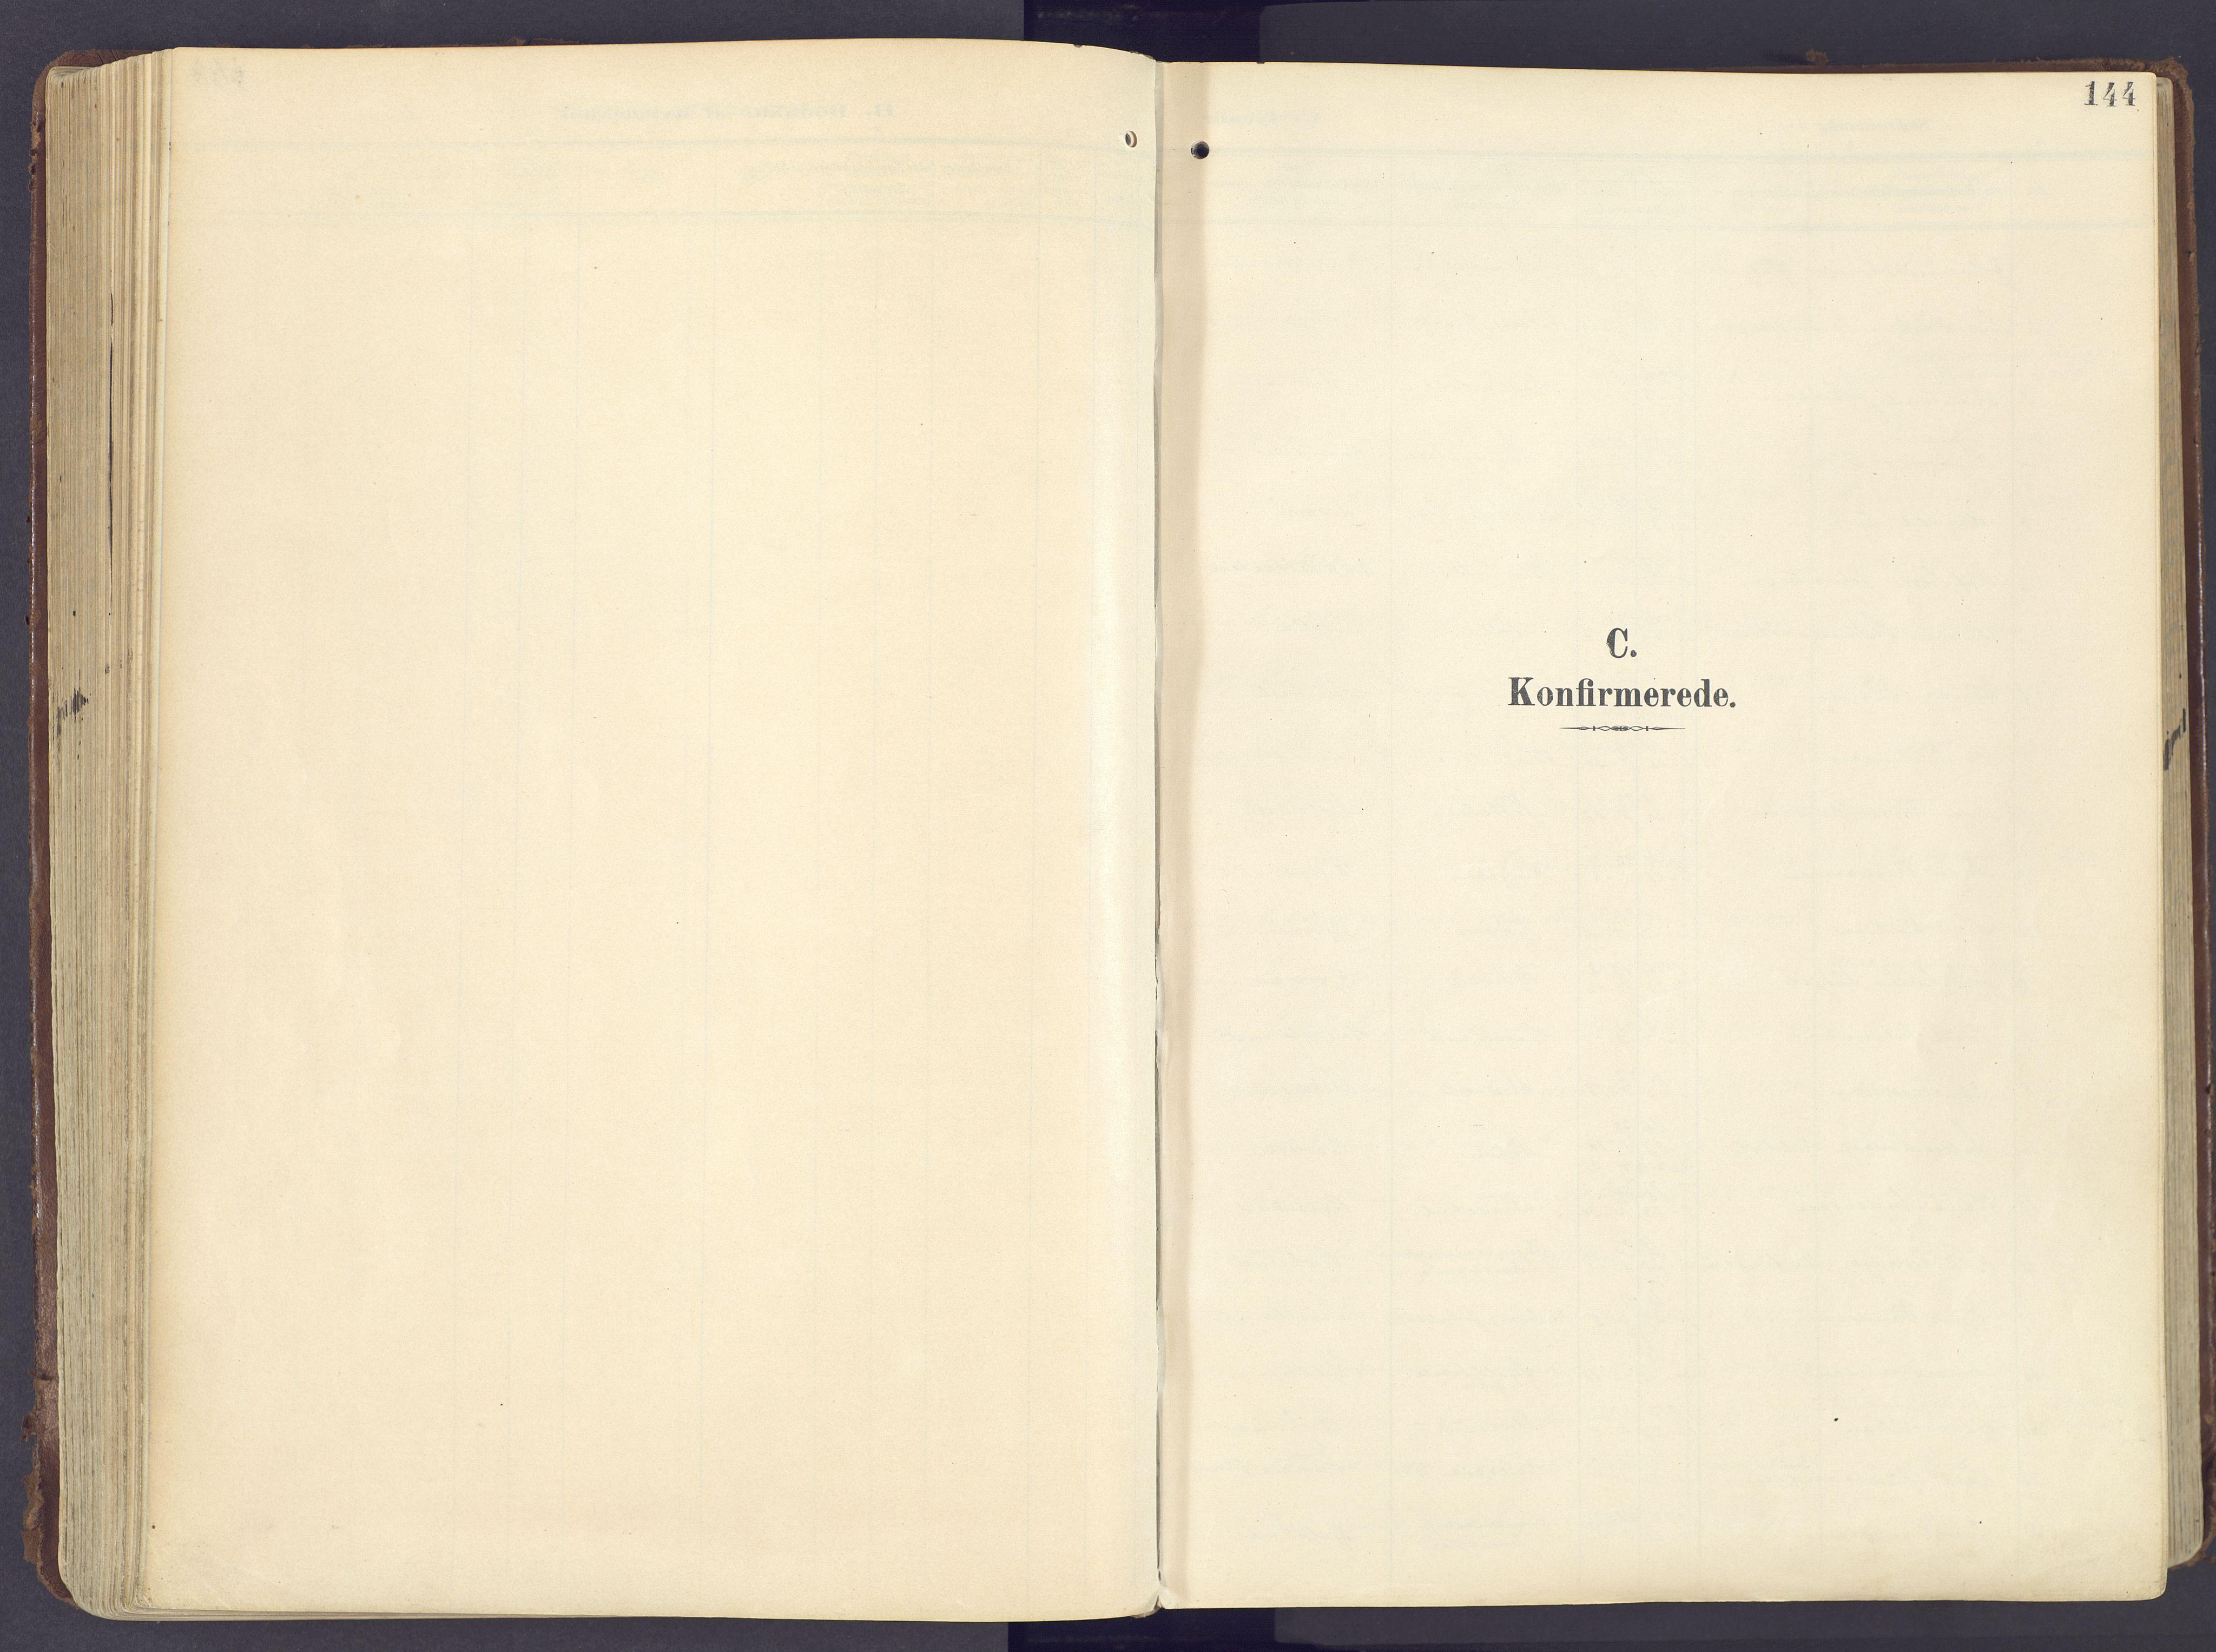 SAH, Lunner prestekontor, H/Ha/Haa/L0001: Ministerialbok nr. 1, 1907-1922, s. 144